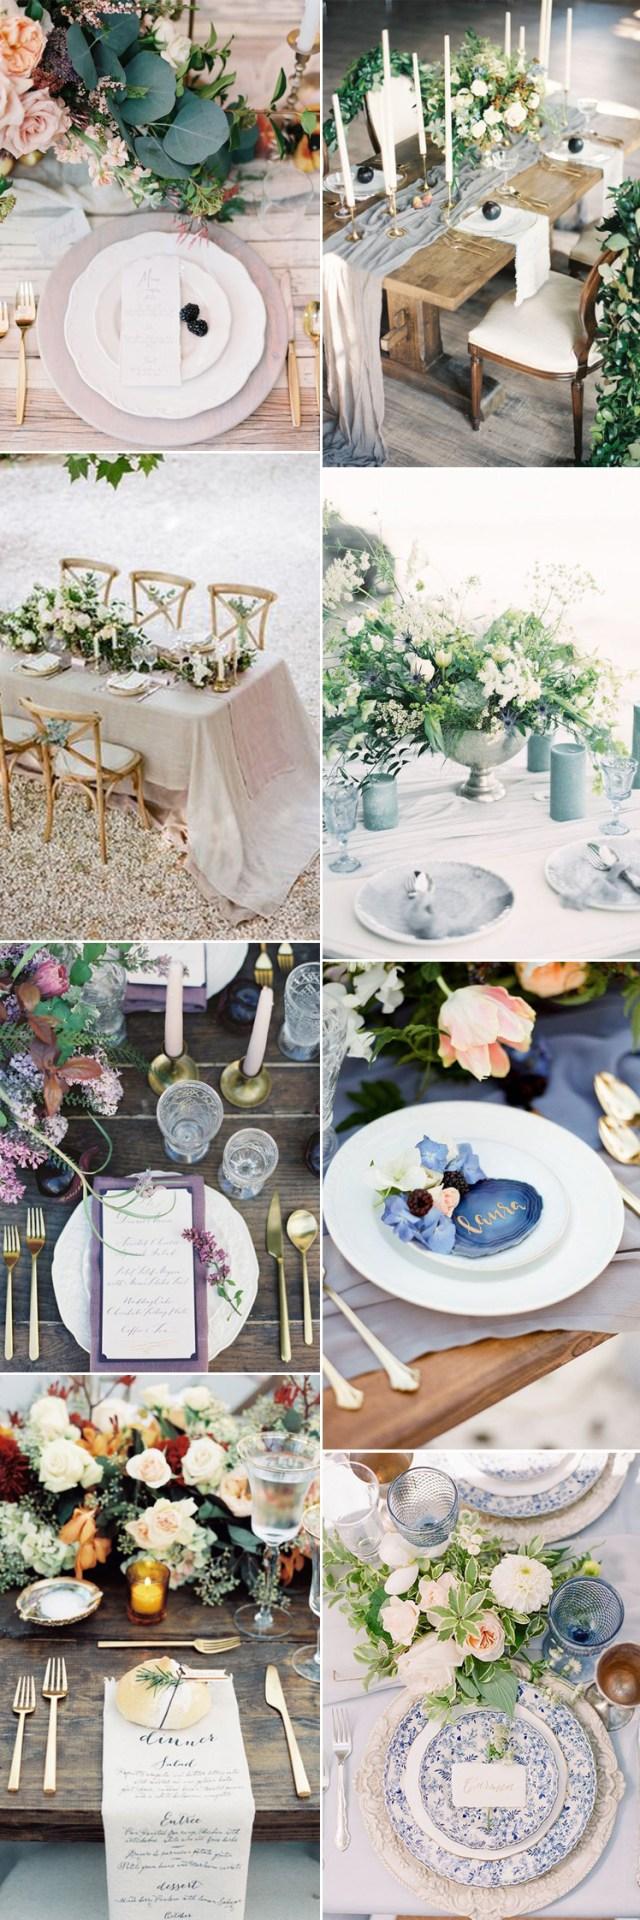 Wedding Tablescapes Ideas Beautifully Romantic Tablescape Ideas Glitzy Secrets